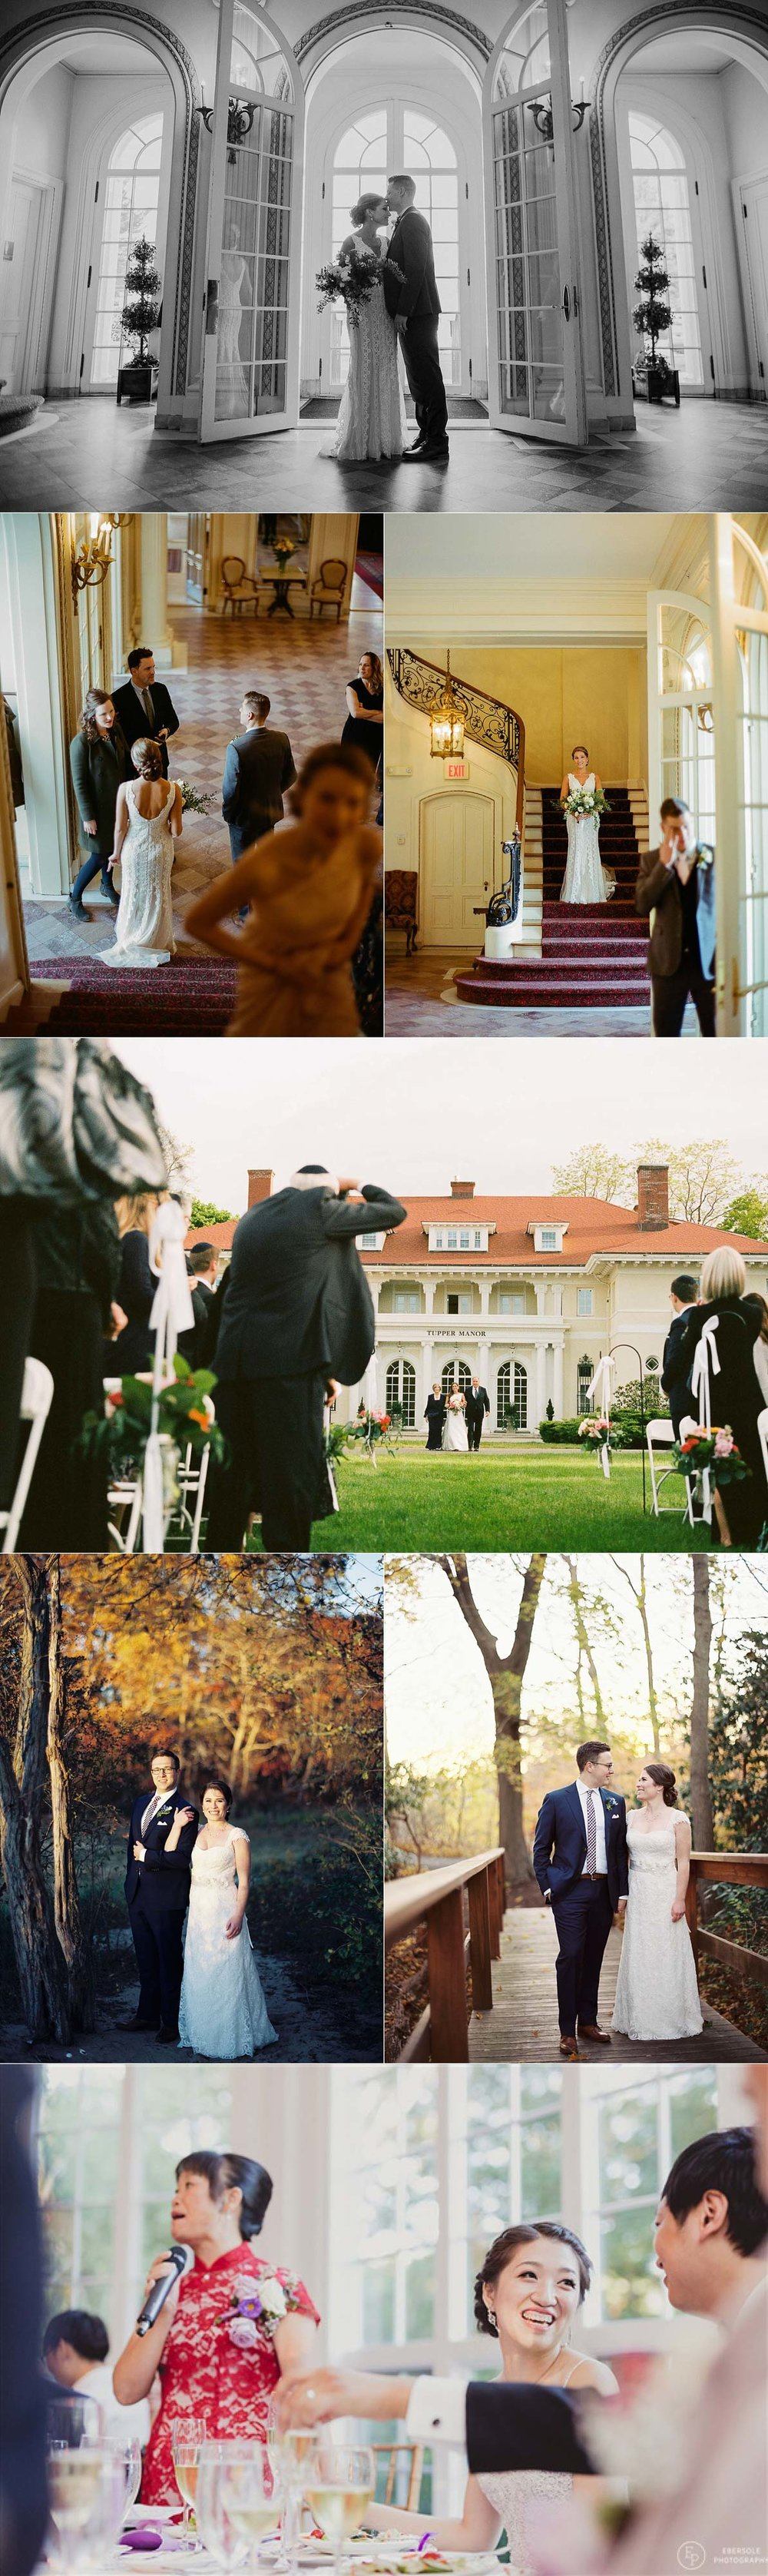 Tupper Manor Wedding - Ebersole Photography-1.jpg